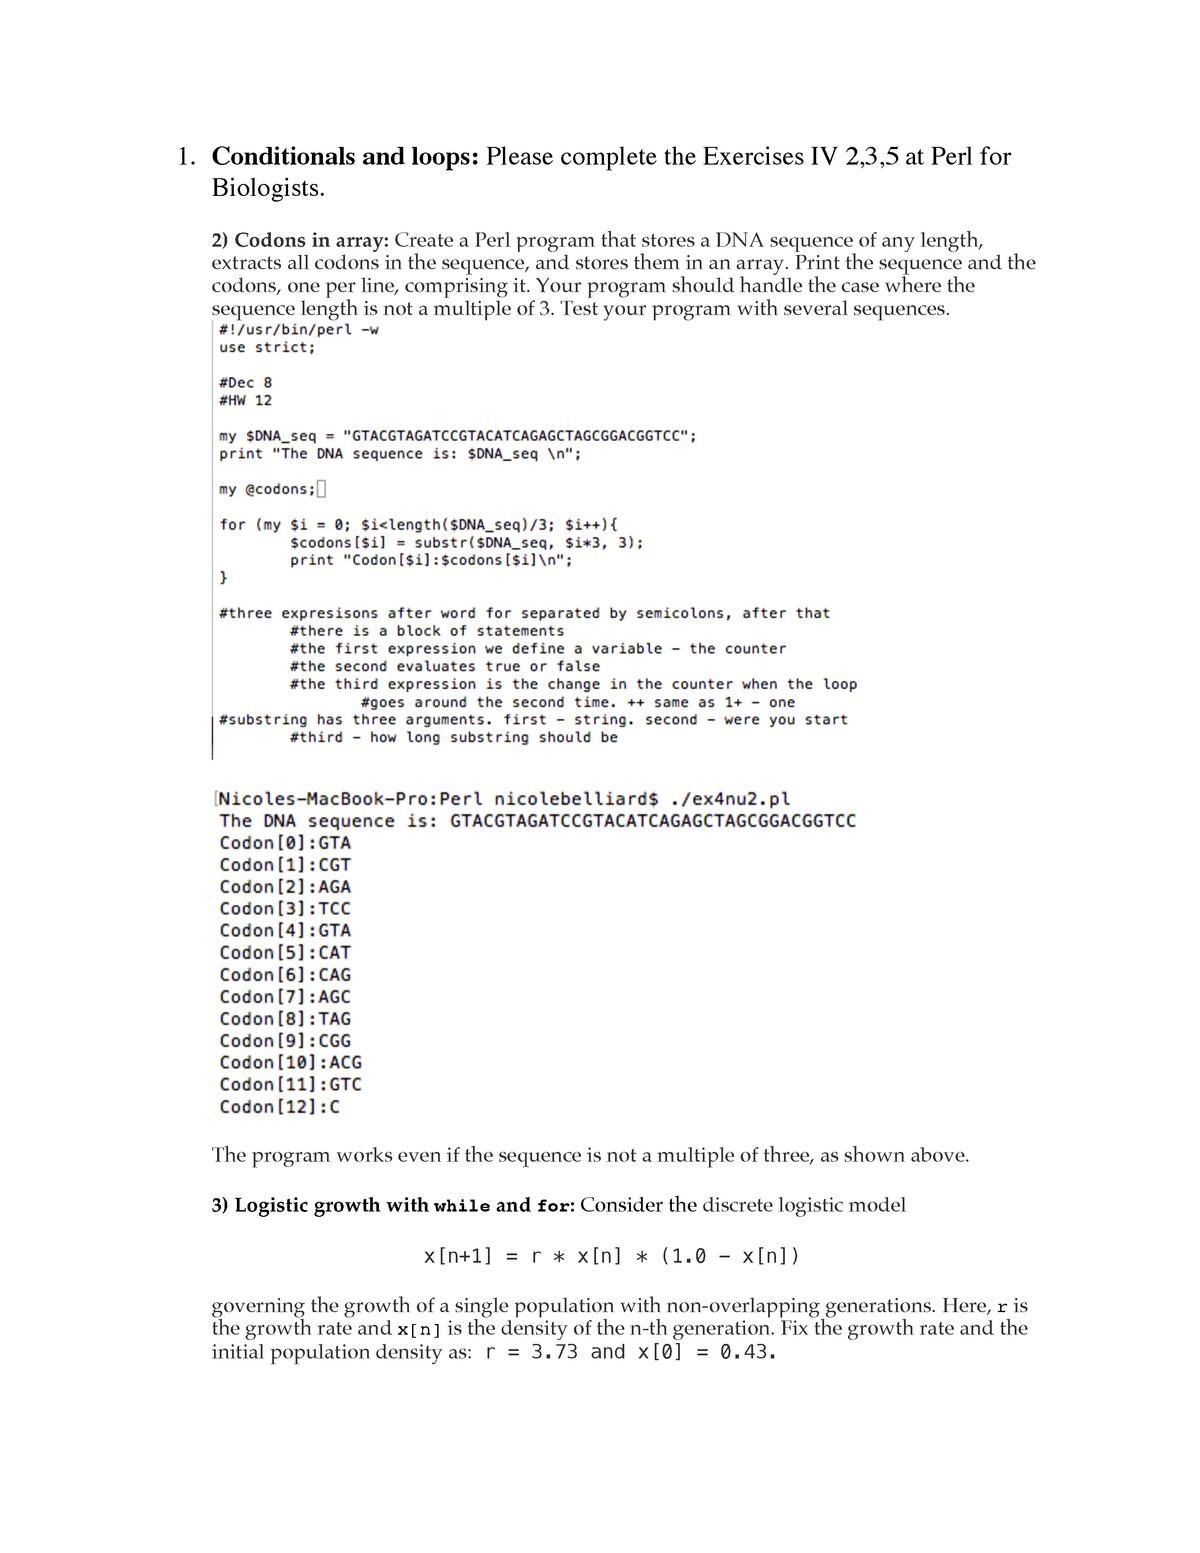 homework 12 file 1 - EN 601 501 : Computer Science Workshop - StuDocu